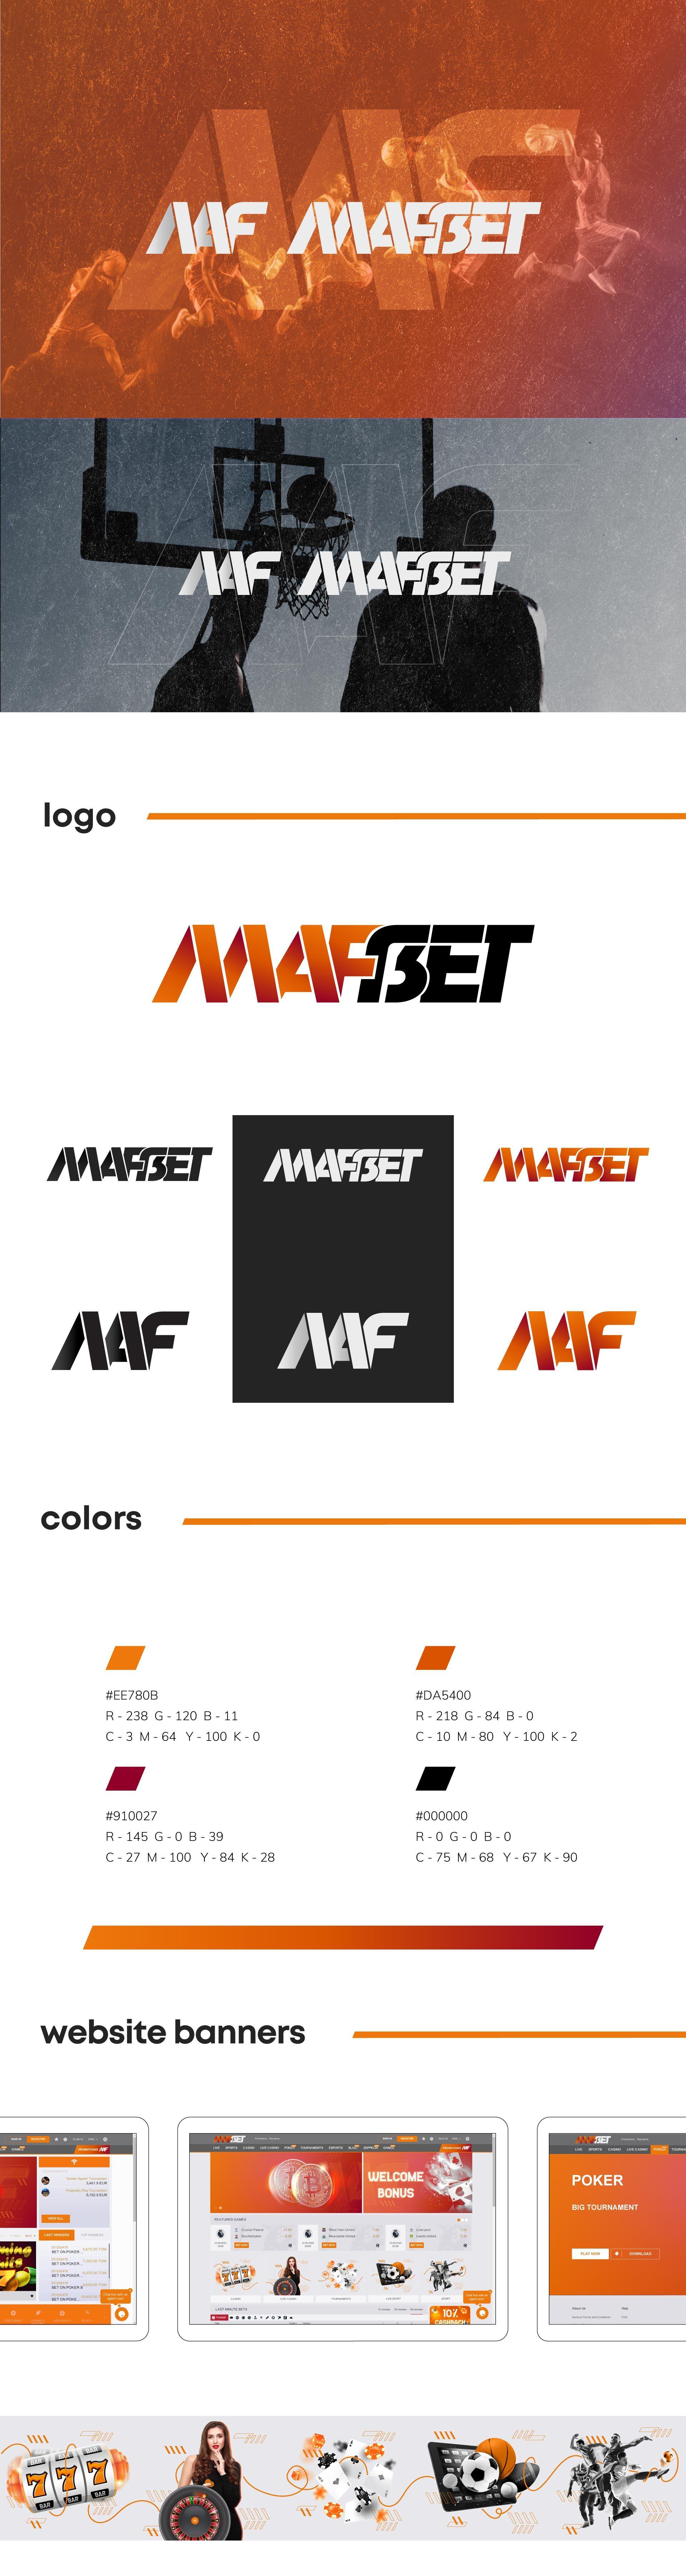 MafBet